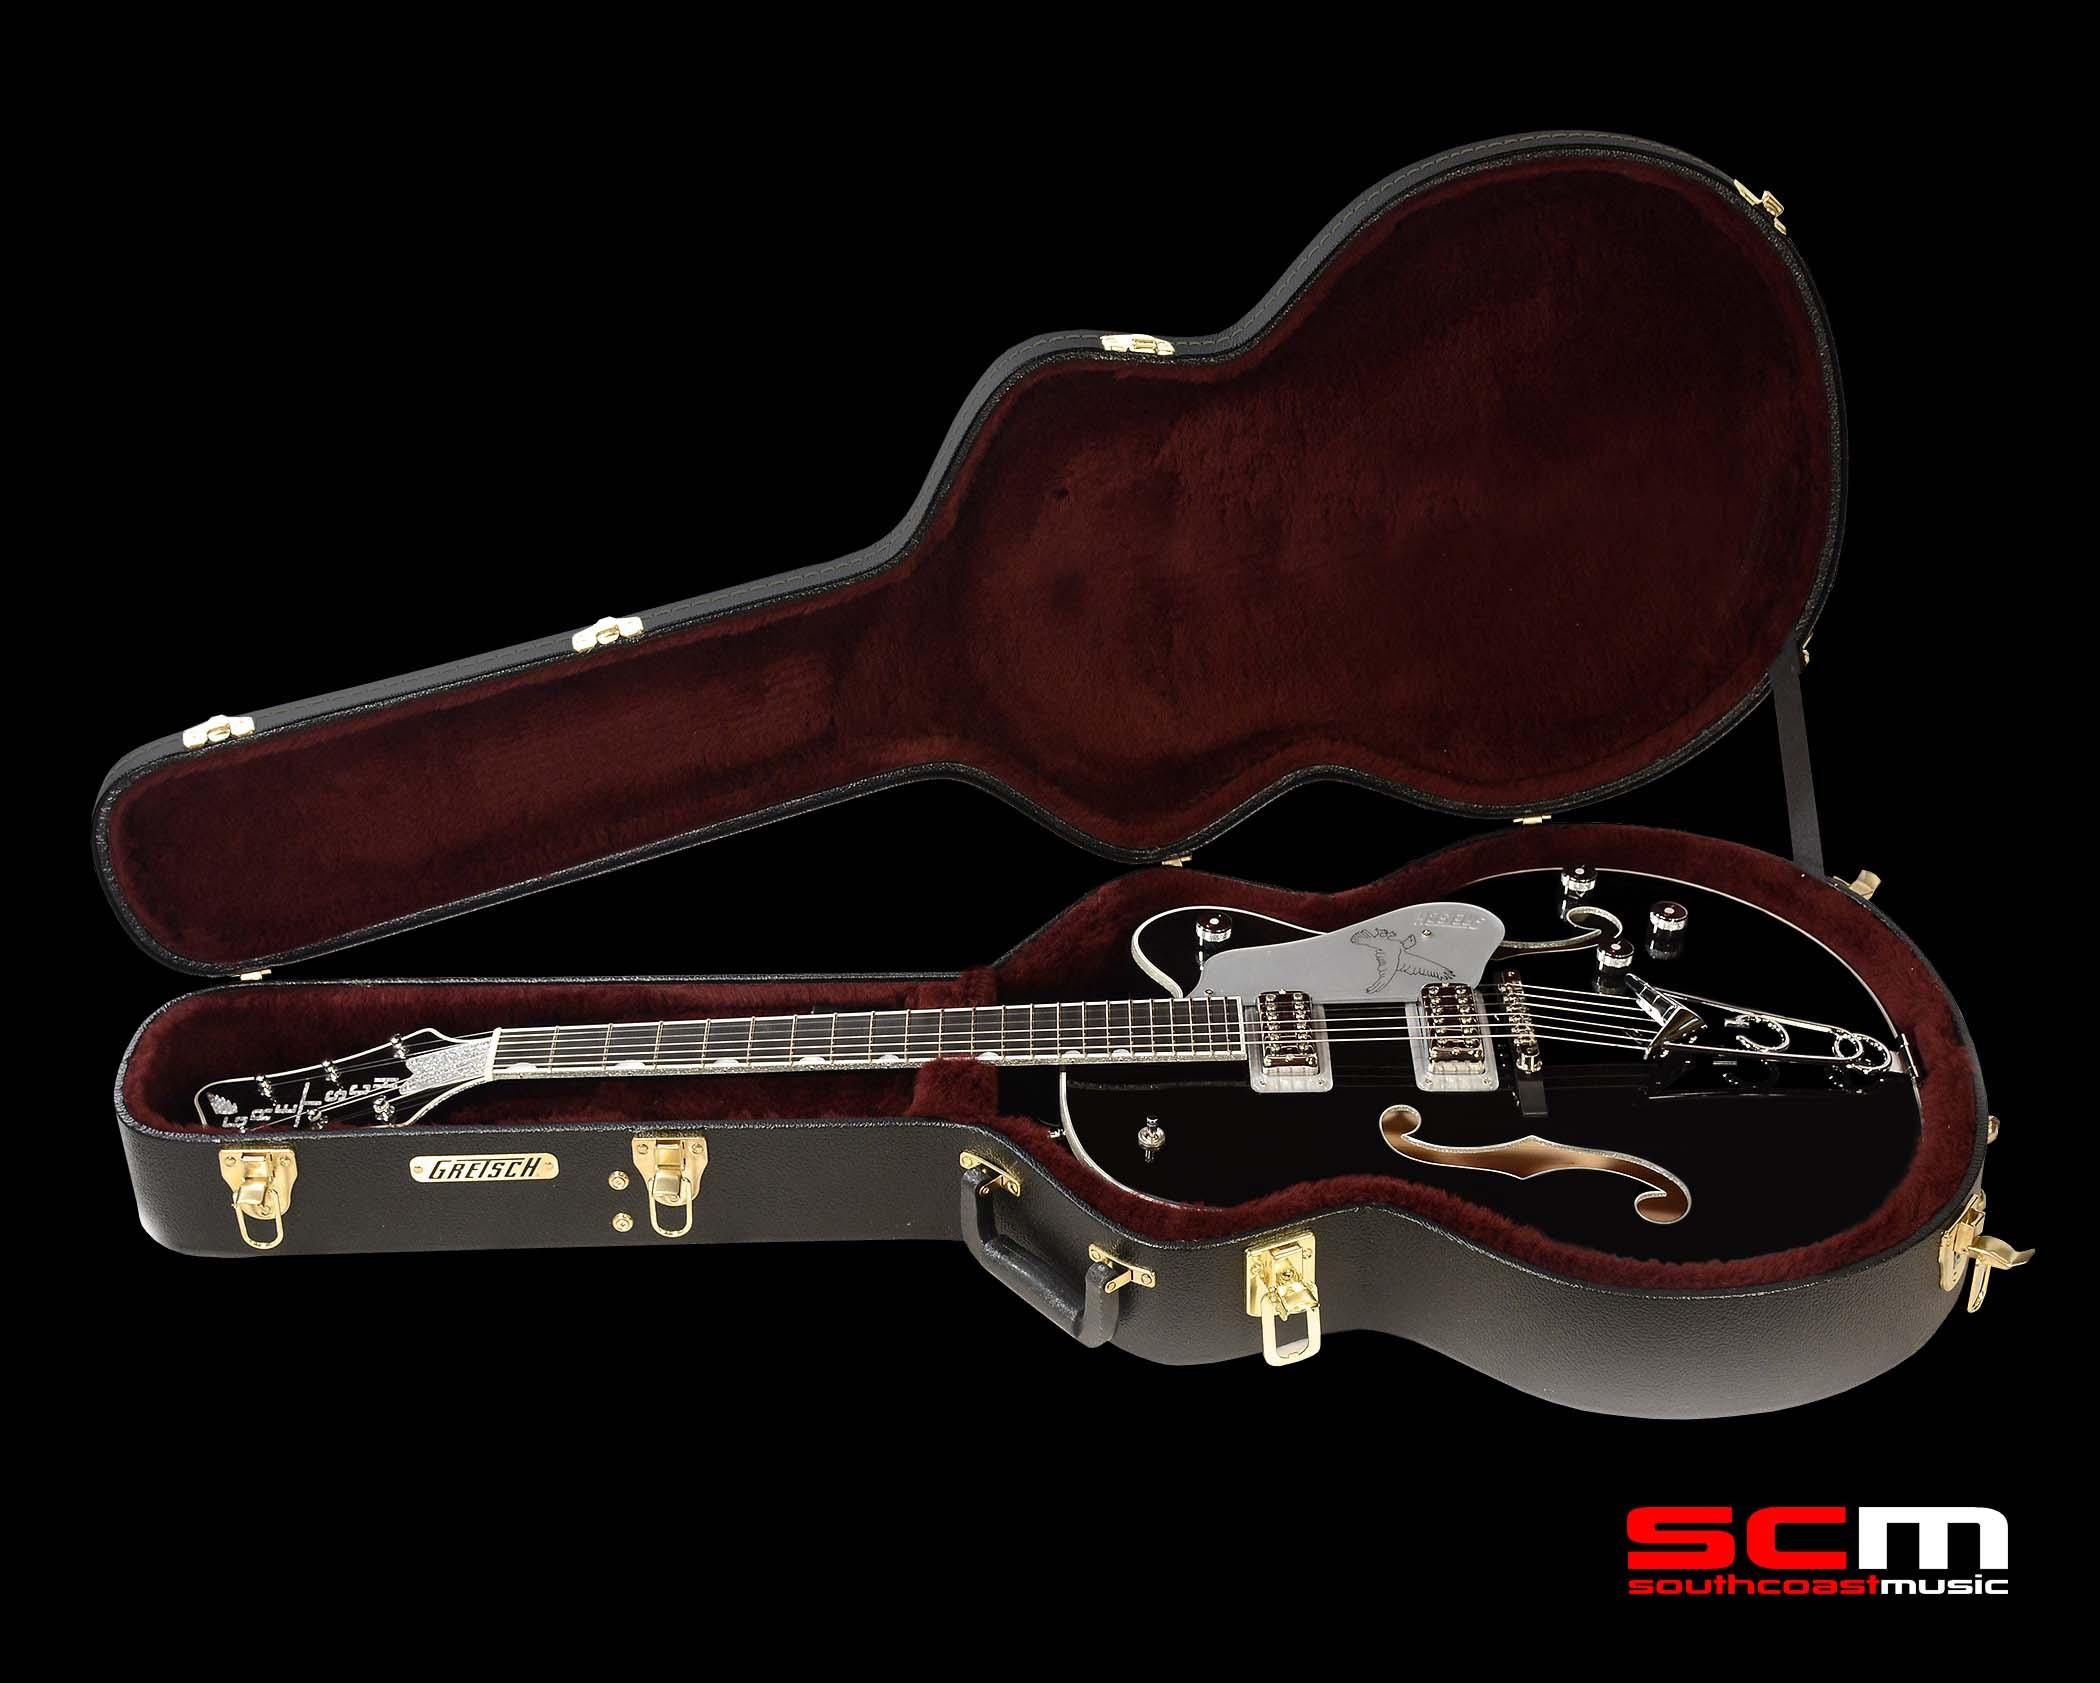 gretsch electric guitar g6139cb silver falcon center block single cutaway south coast music. Black Bedroom Furniture Sets. Home Design Ideas